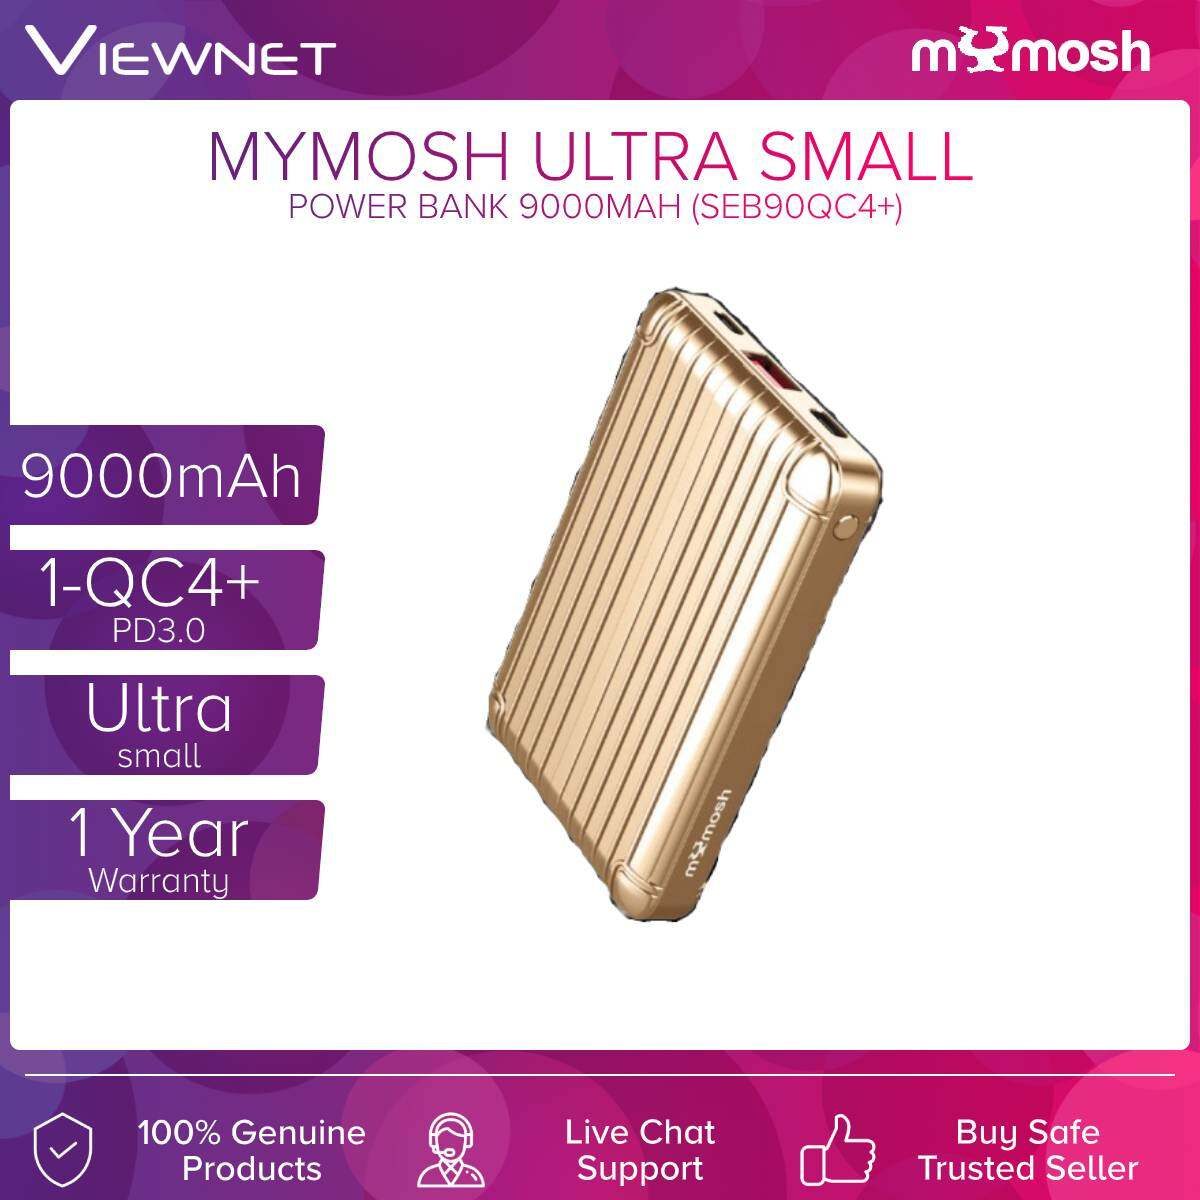 Mymosh (SEB90QC4+) 9000mAh 1-QC4+ PD3.0 Ultra Small Power Bank Gold / Green / Silver/ Black